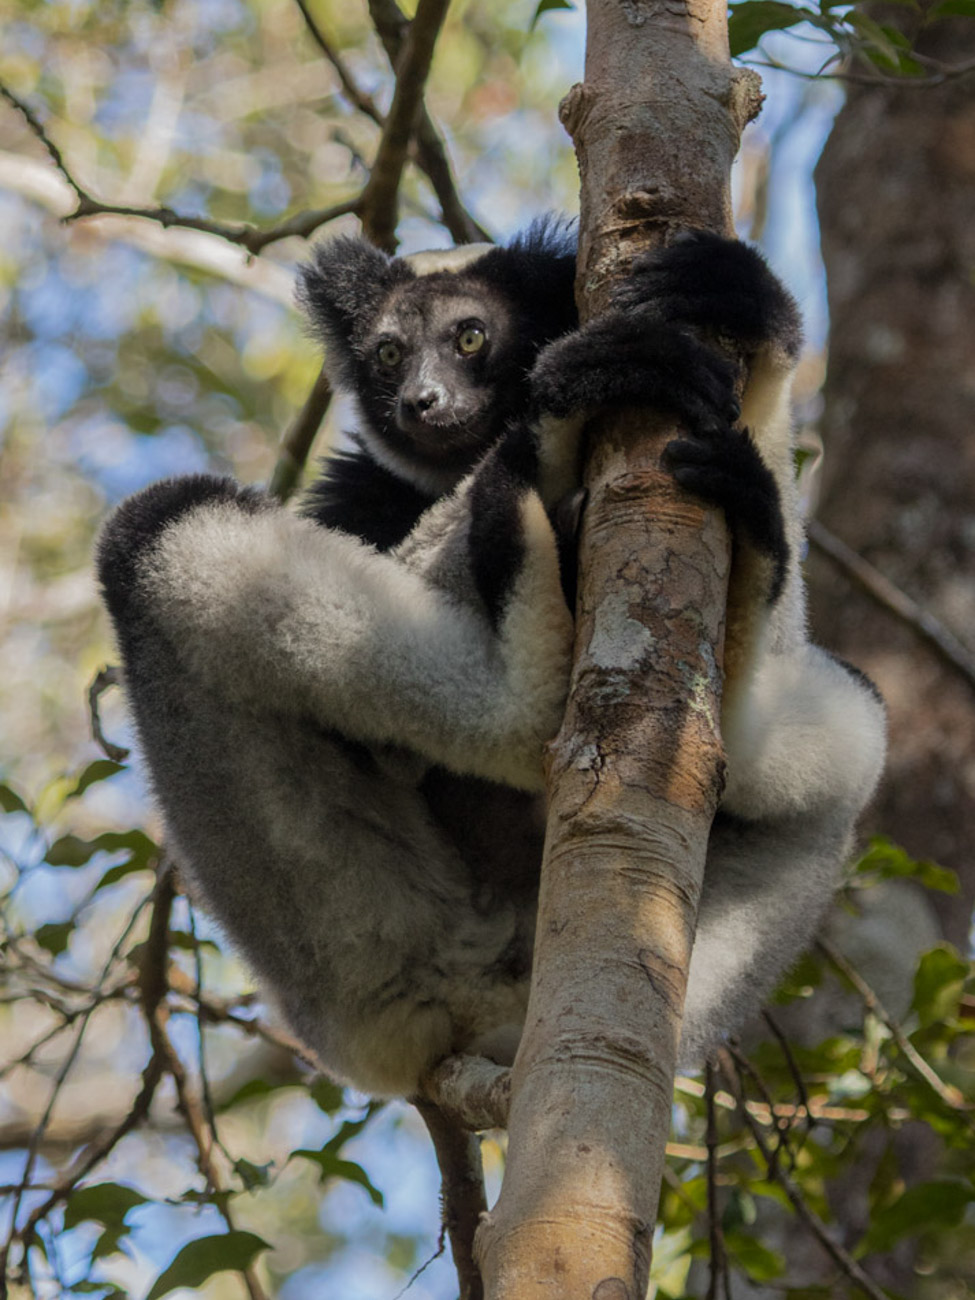 Indri, Reserve Speciale d'Analamazaotra (Andasibe National Park)